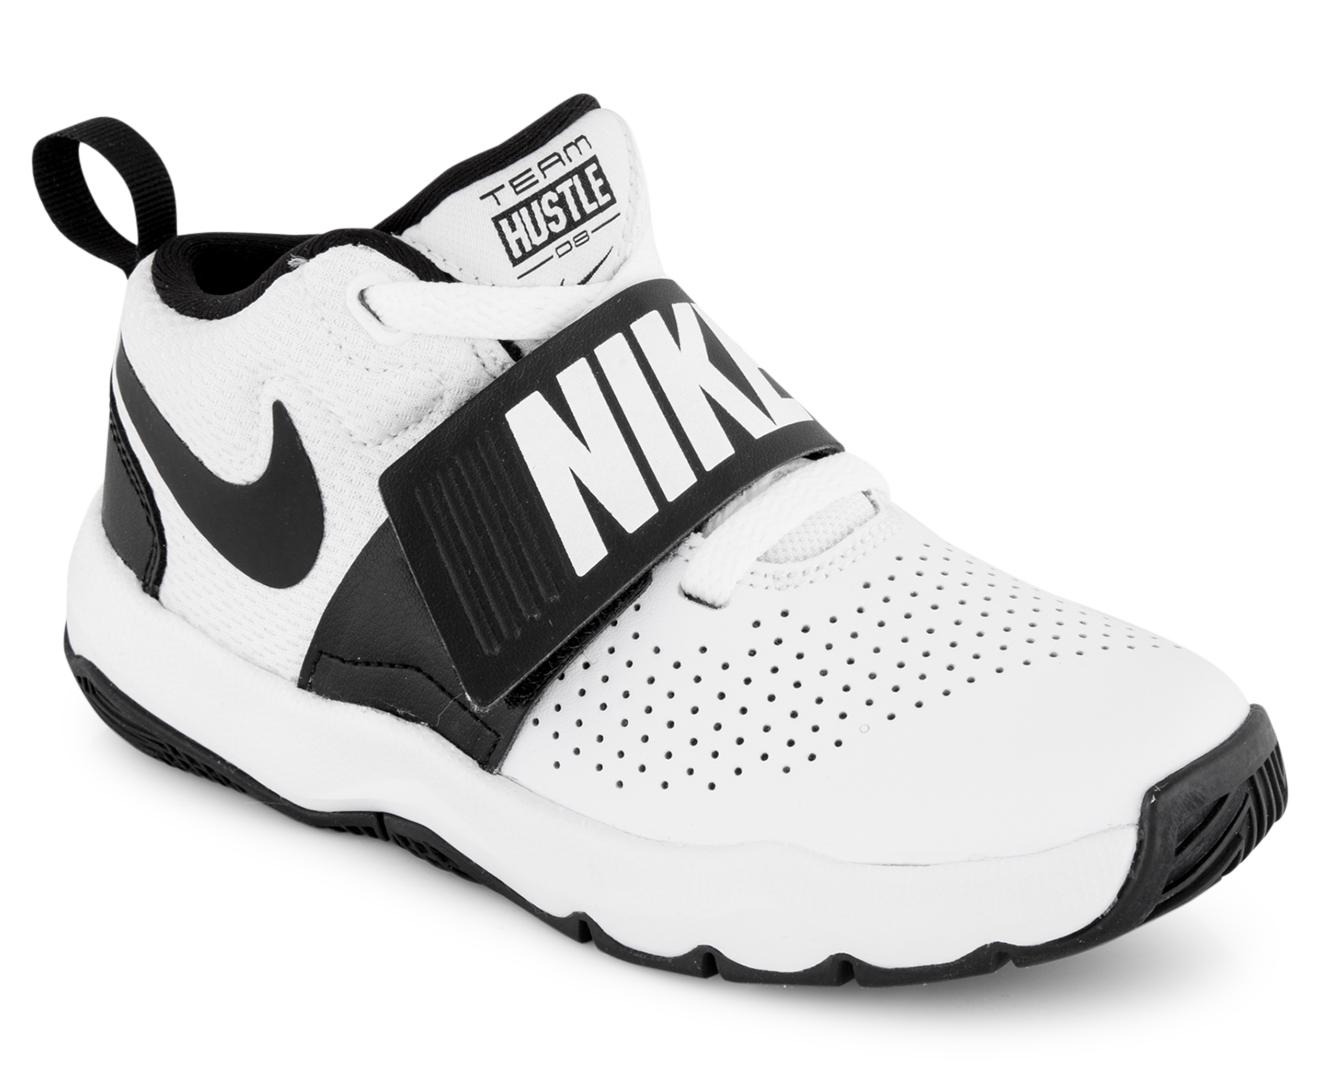 Nike Boys' Pre-School Team Hustle D 8 Shoe - White/Black